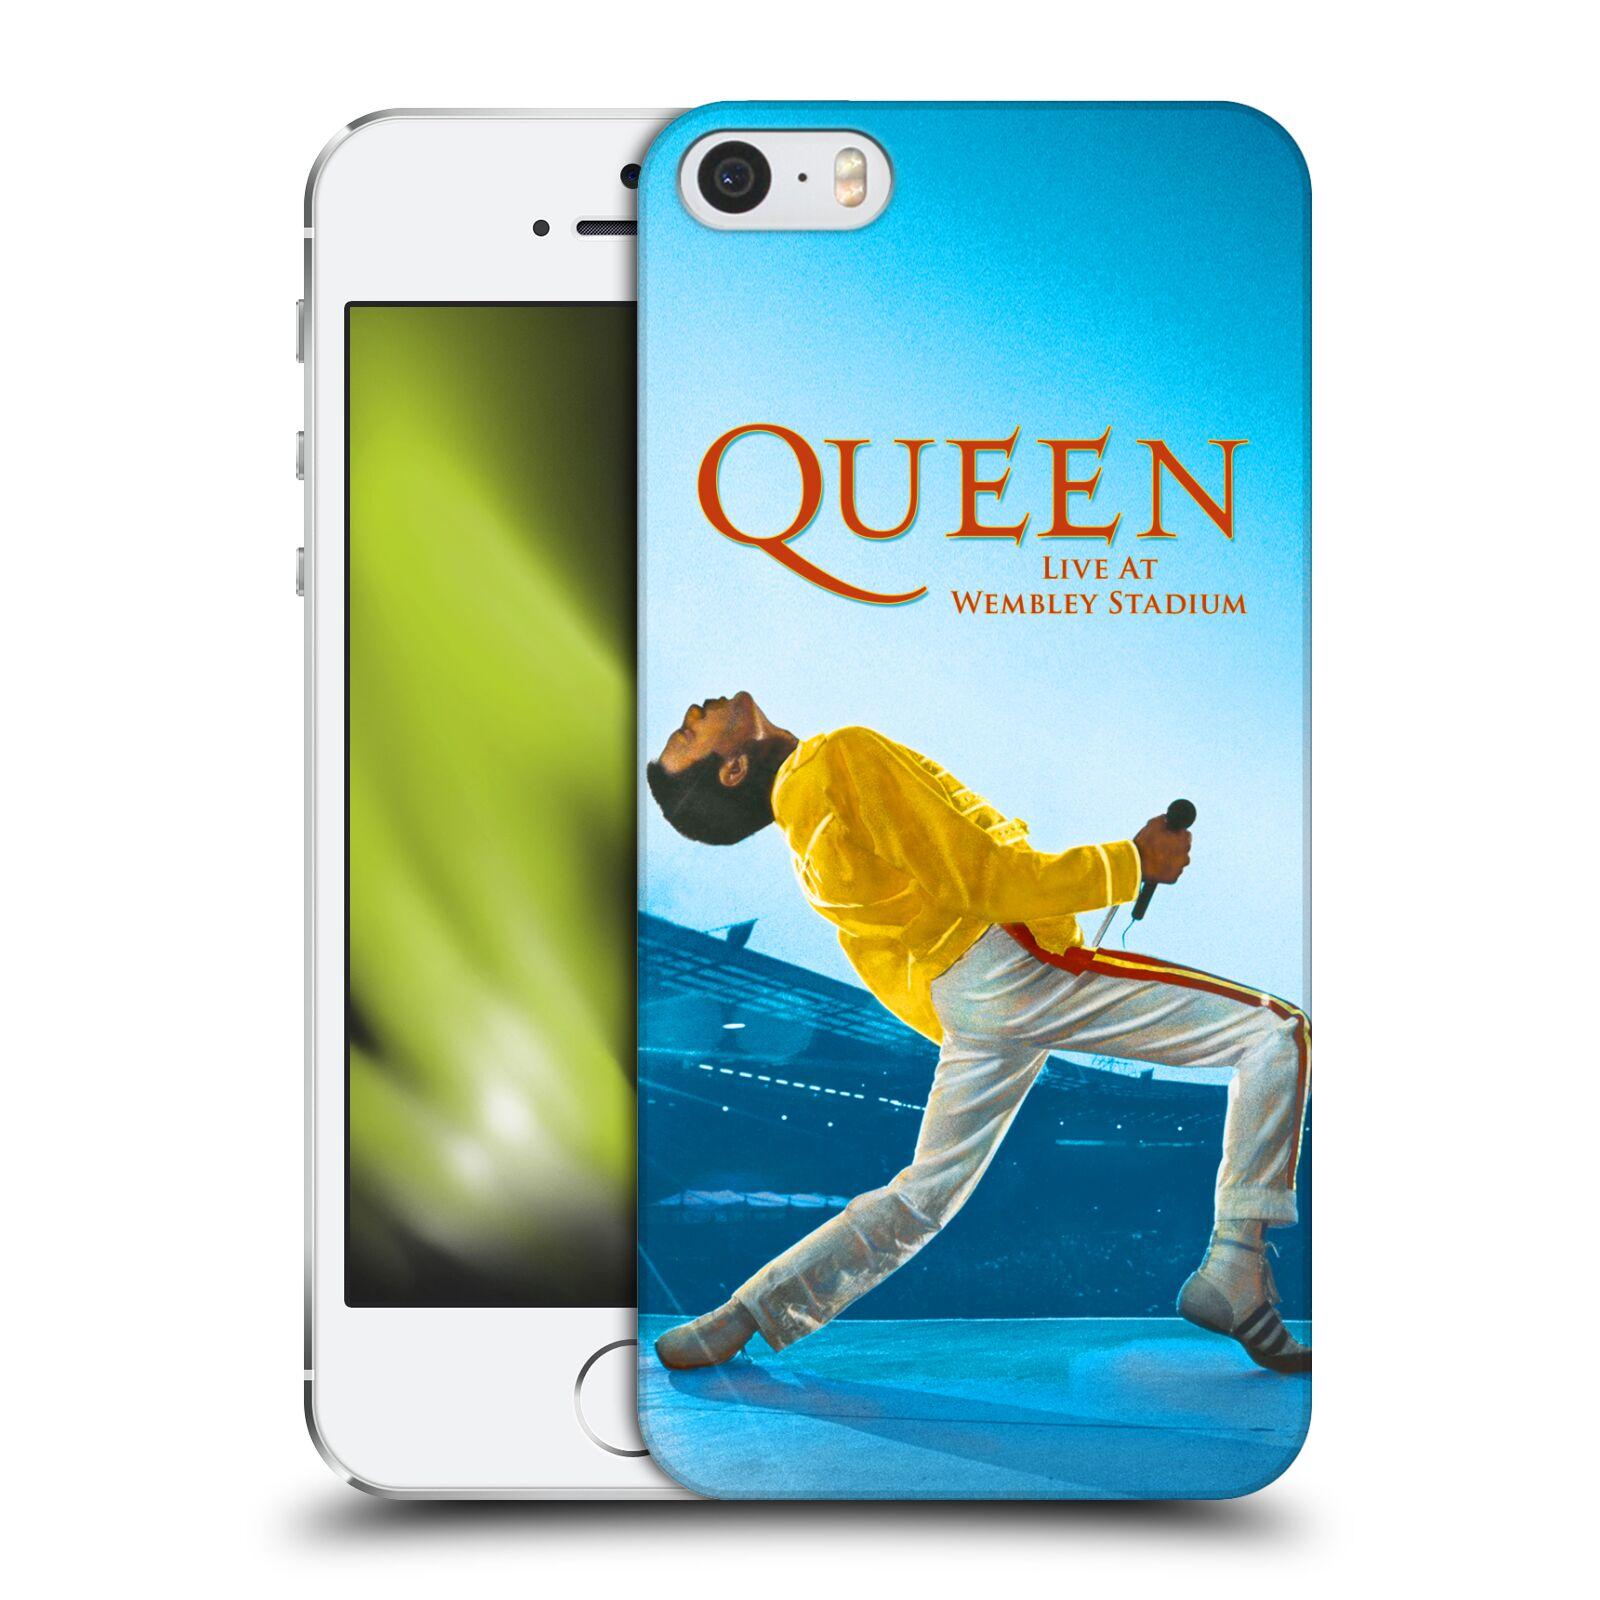 Plastové pouzdro pro mobil Apple Iphone 5   5S   SE zpěvák Queen skupina  Freddie Mercury b28507aadf6